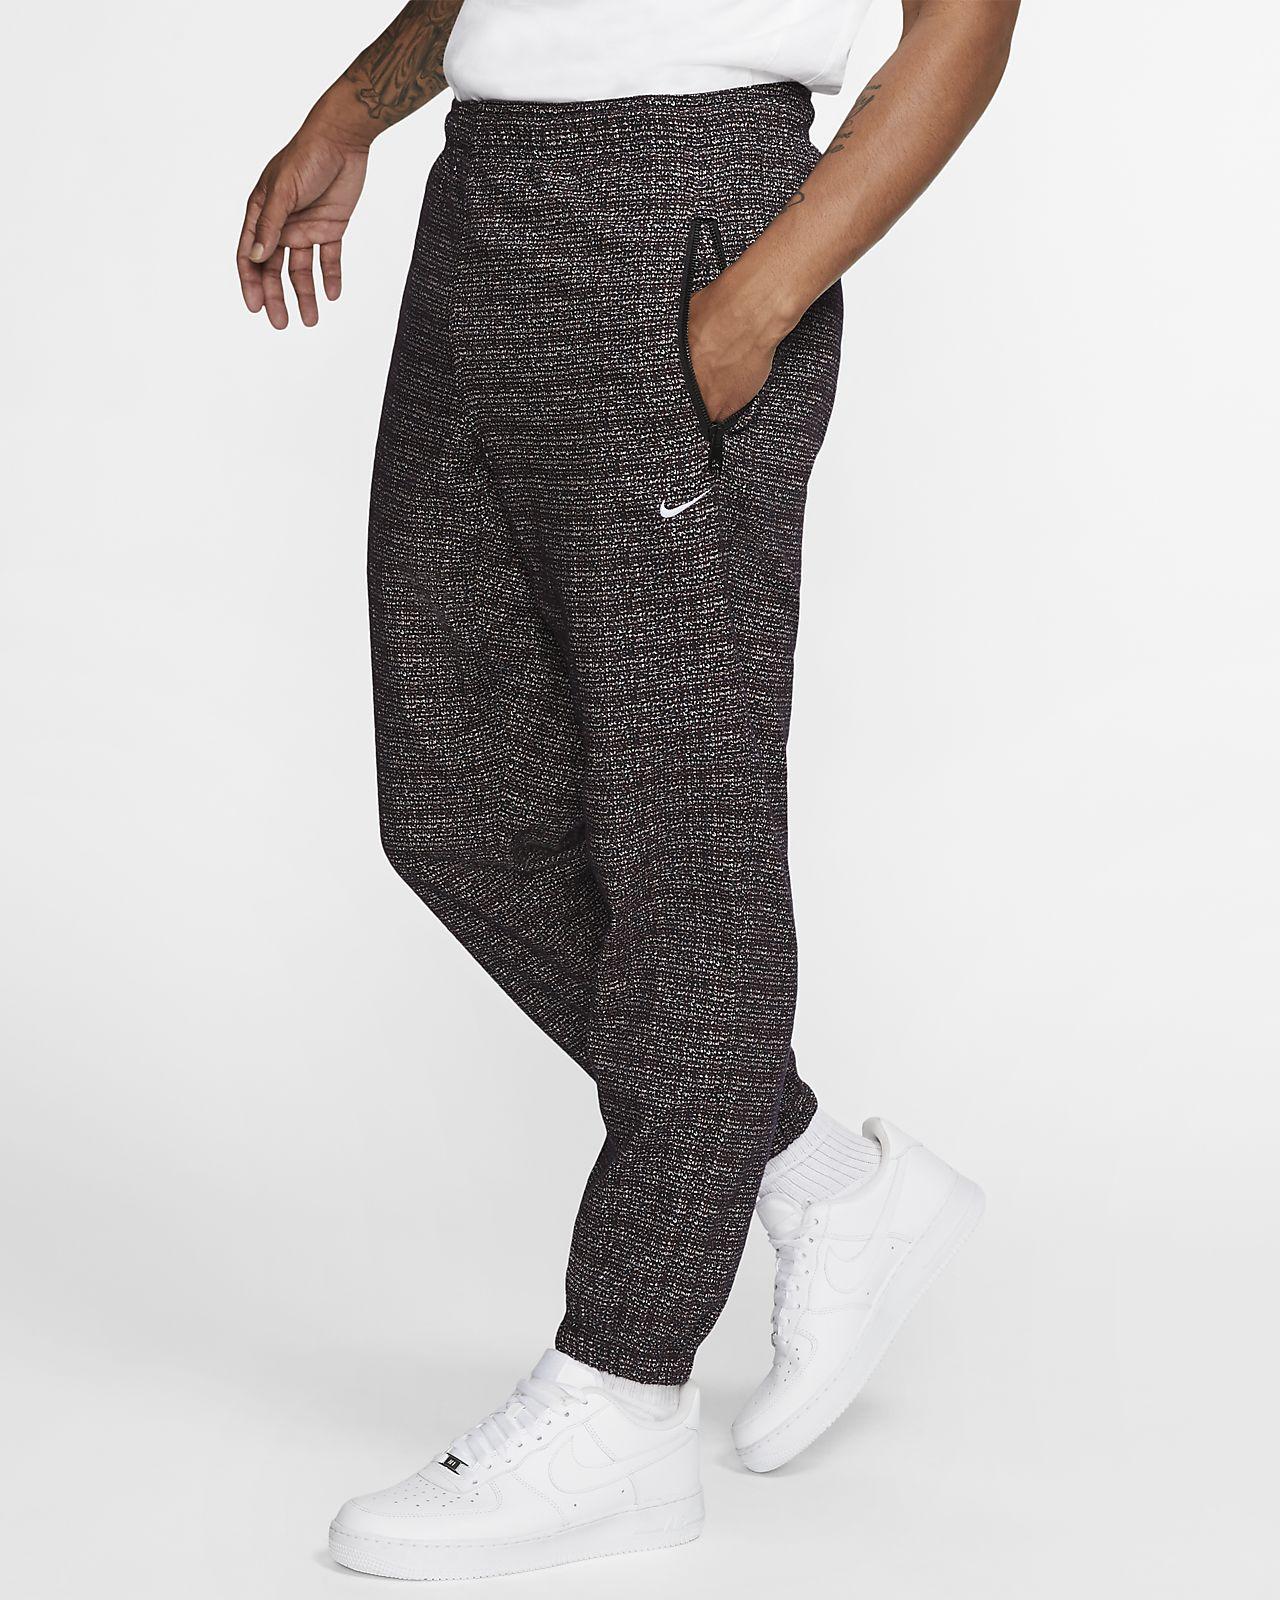 Nike Classic x Sport 男子长裤